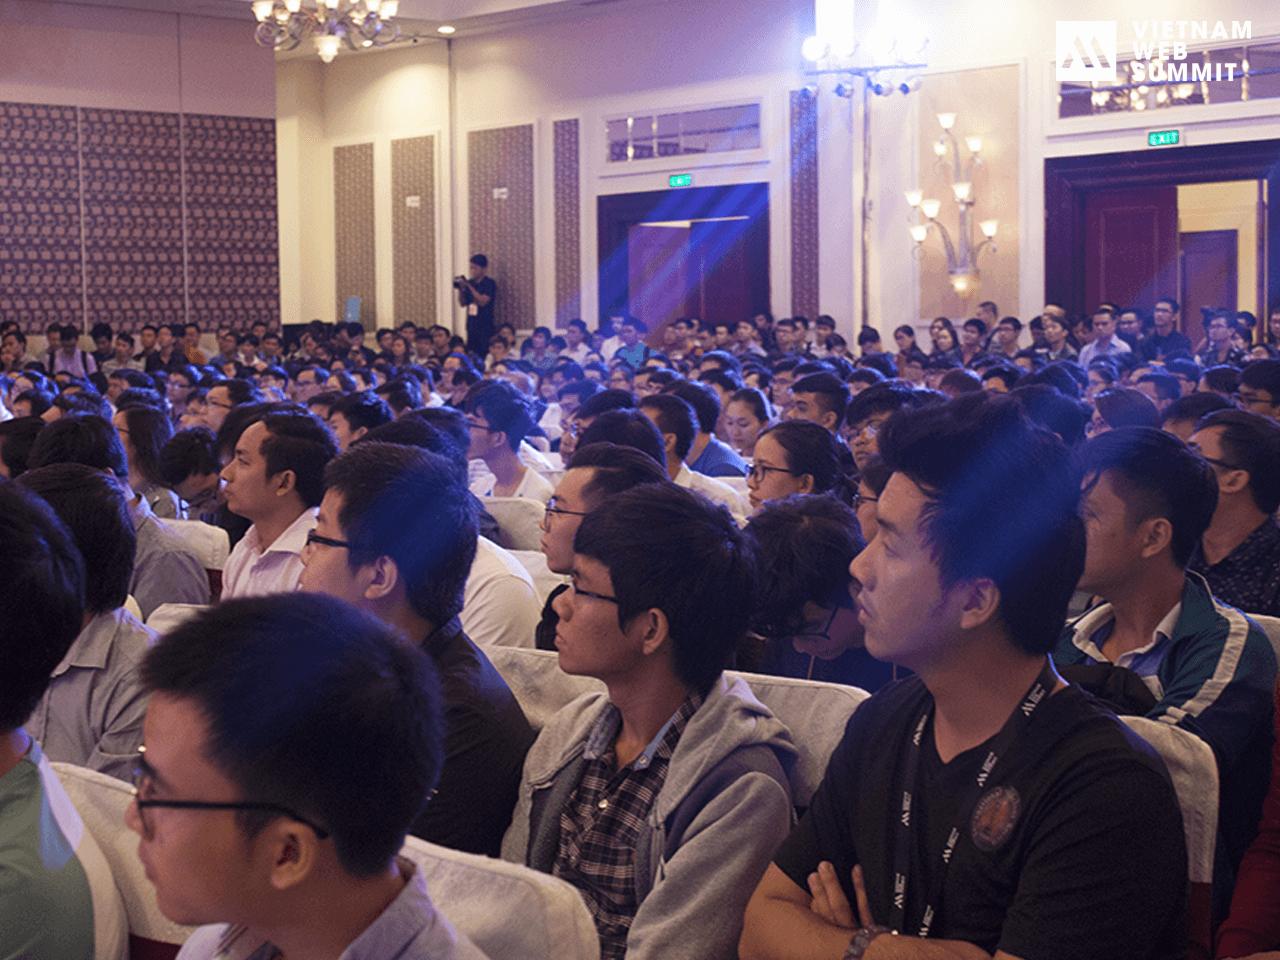 Lễ khai mạc Vietnam Web Summit 2017 ở Hồ Chí Minh